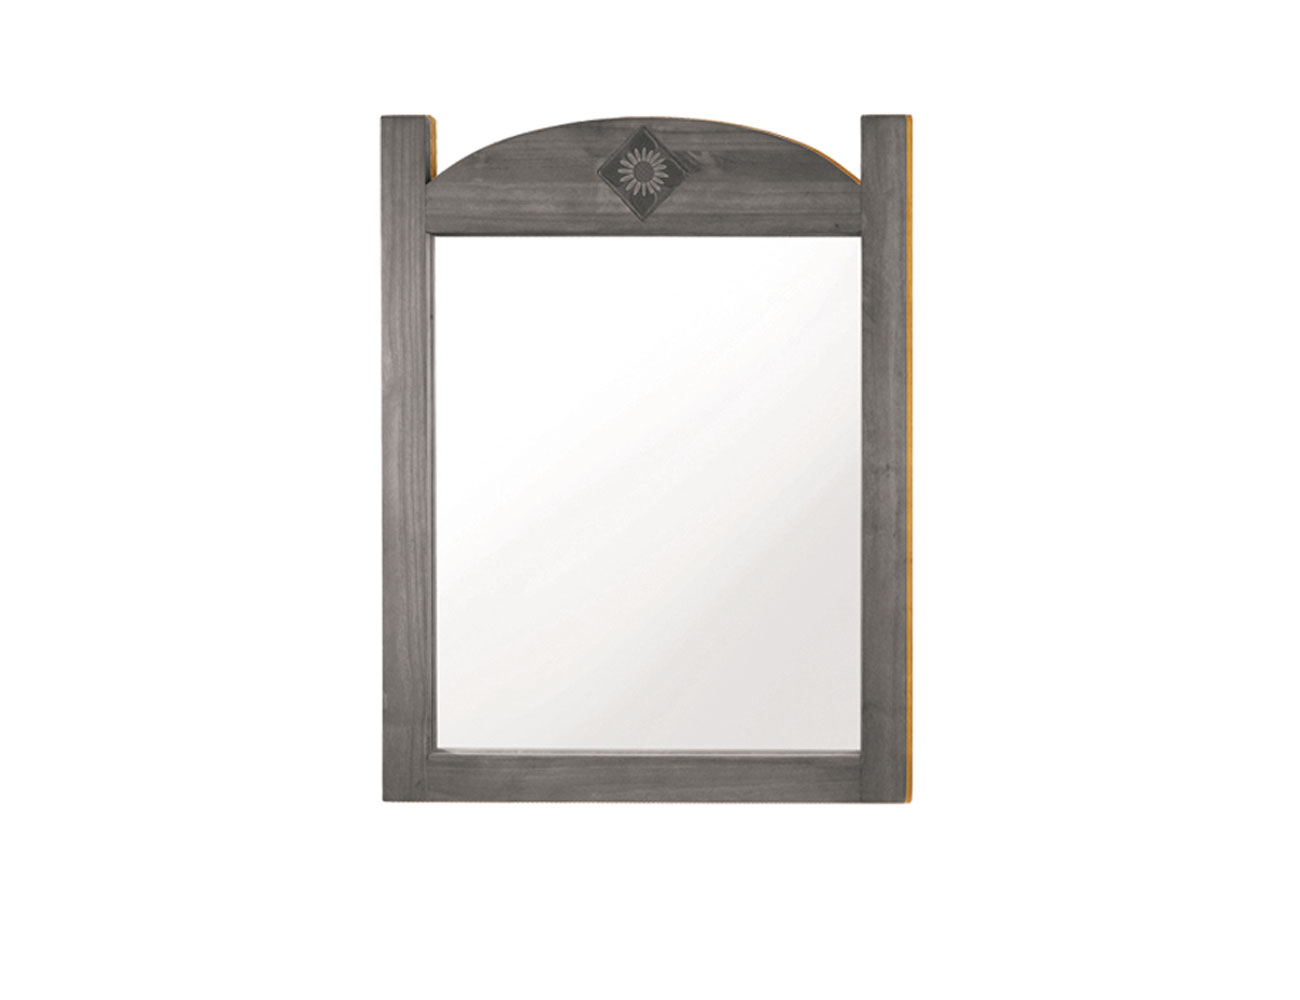 1920102 marco espejo chihuahua girasol 80